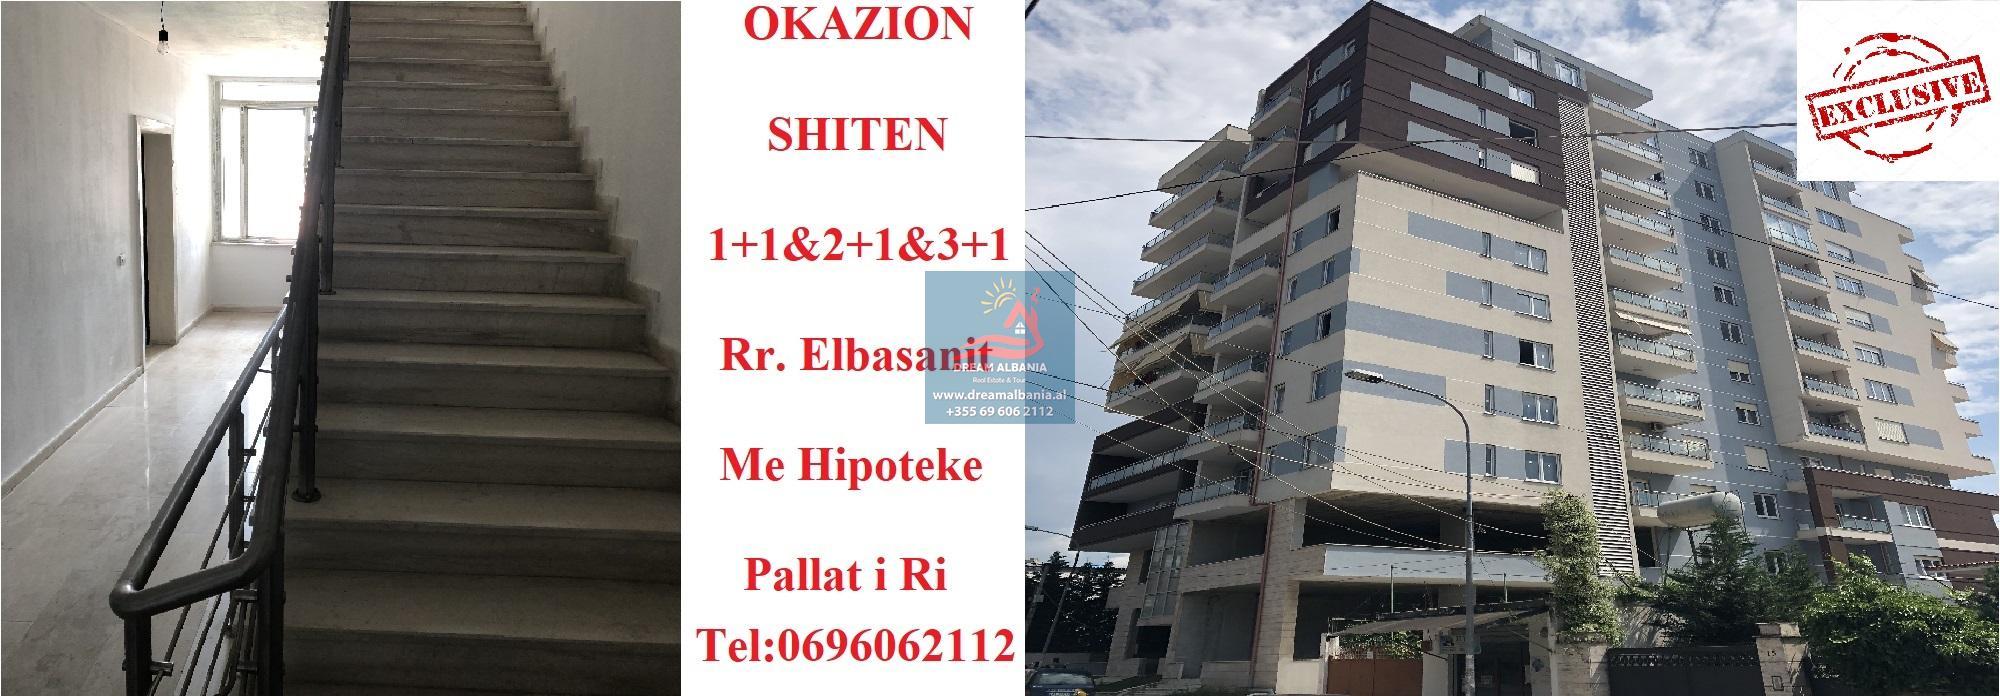 Sold, ID 21838, 13 (thirteen) apartments 2 + 1, Elbasan Street, Tirana